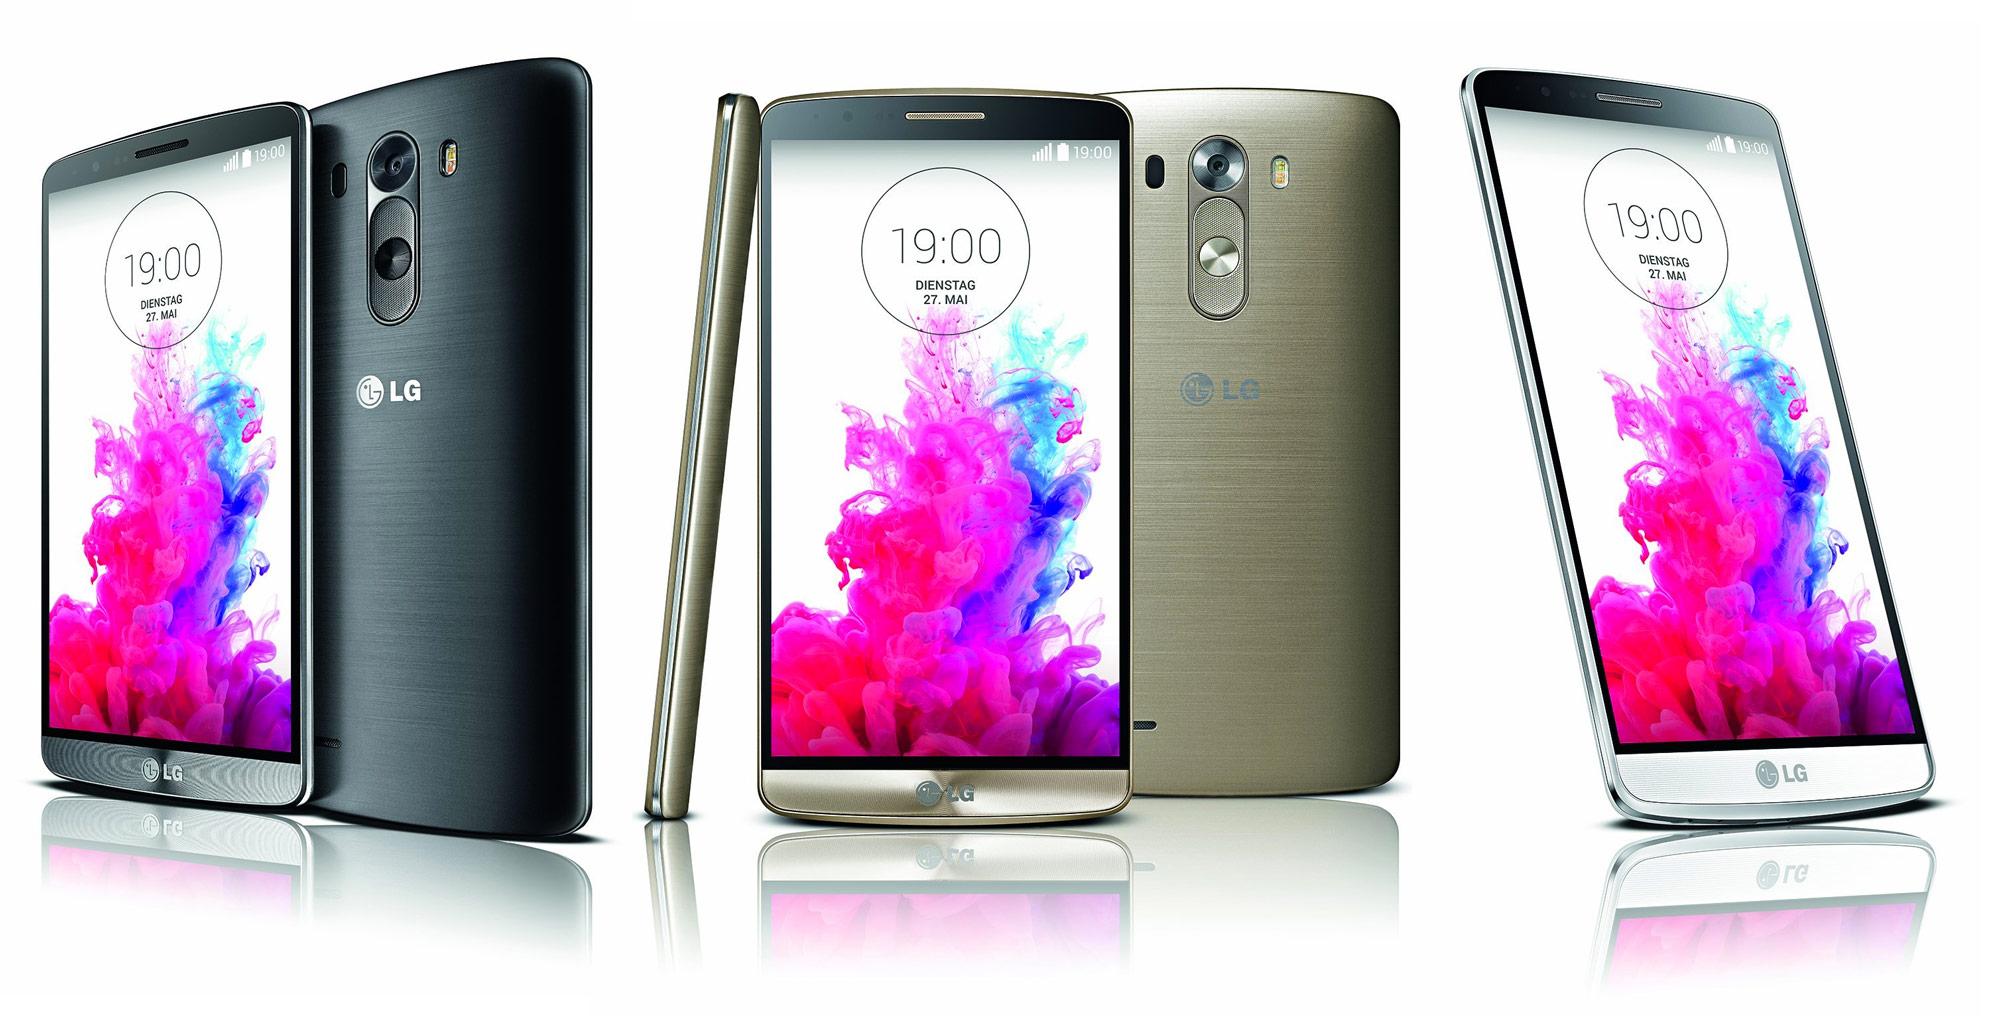 lg g3 smartphone weist oft risse am mikrophon auf andronews. Black Bedroom Furniture Sets. Home Design Ideas